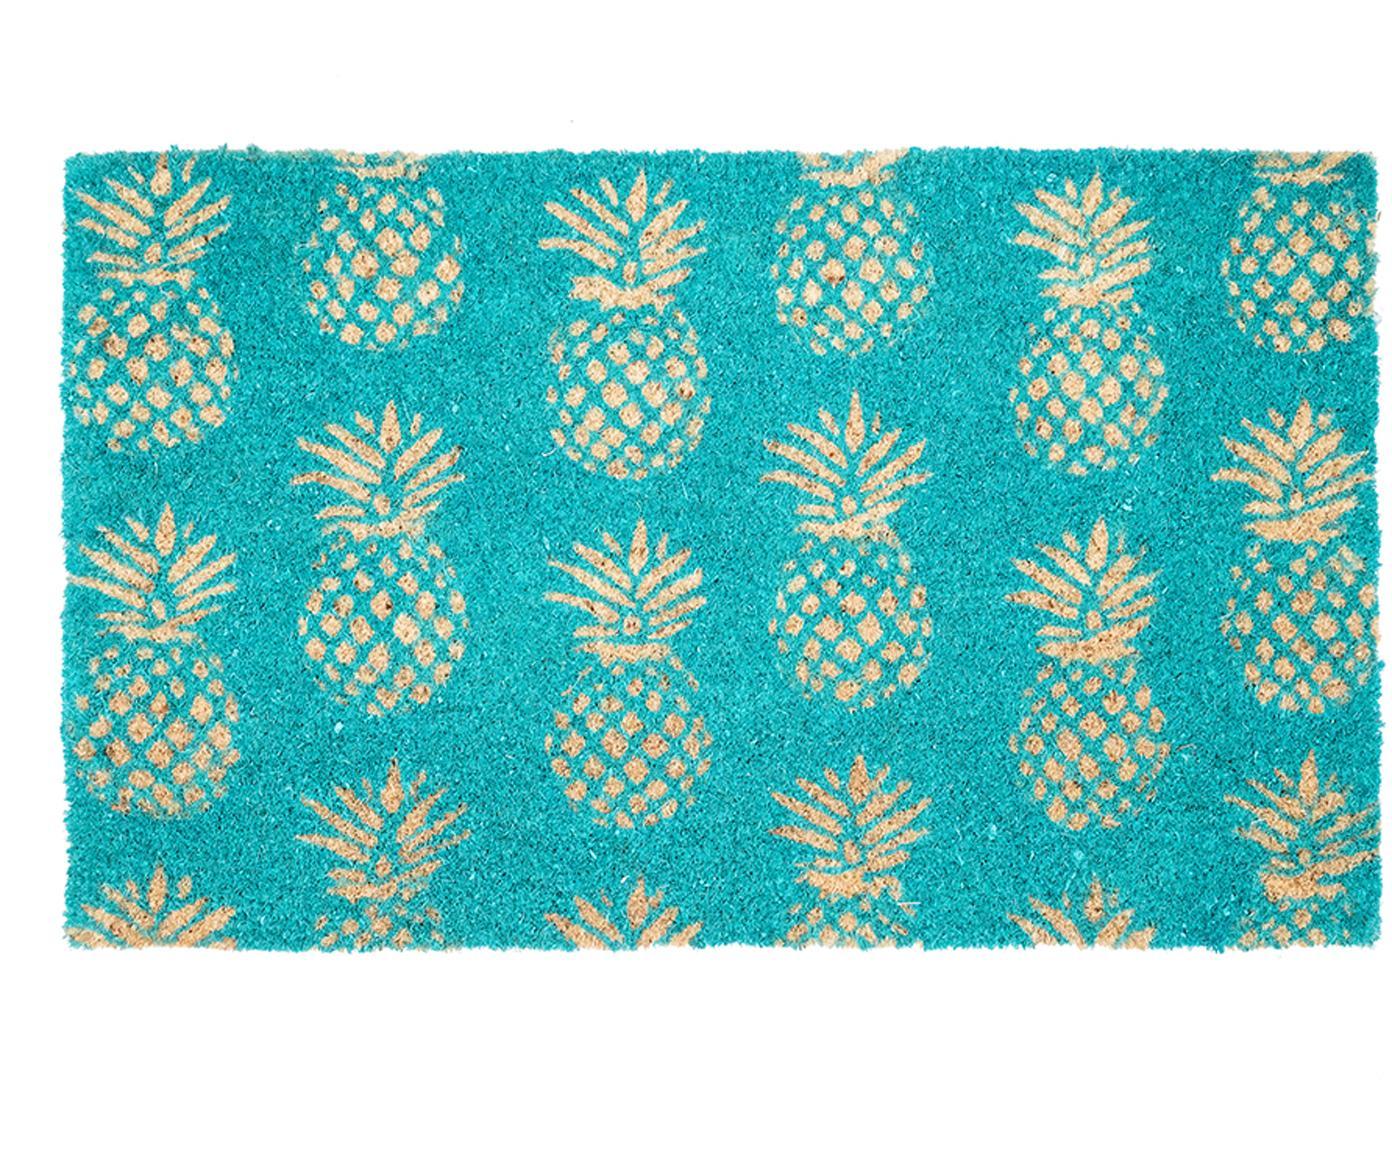 Tappeto Pineapples, Fibra di cocco, Turchese, beige, Larg. 45 x Lung. 75 cm